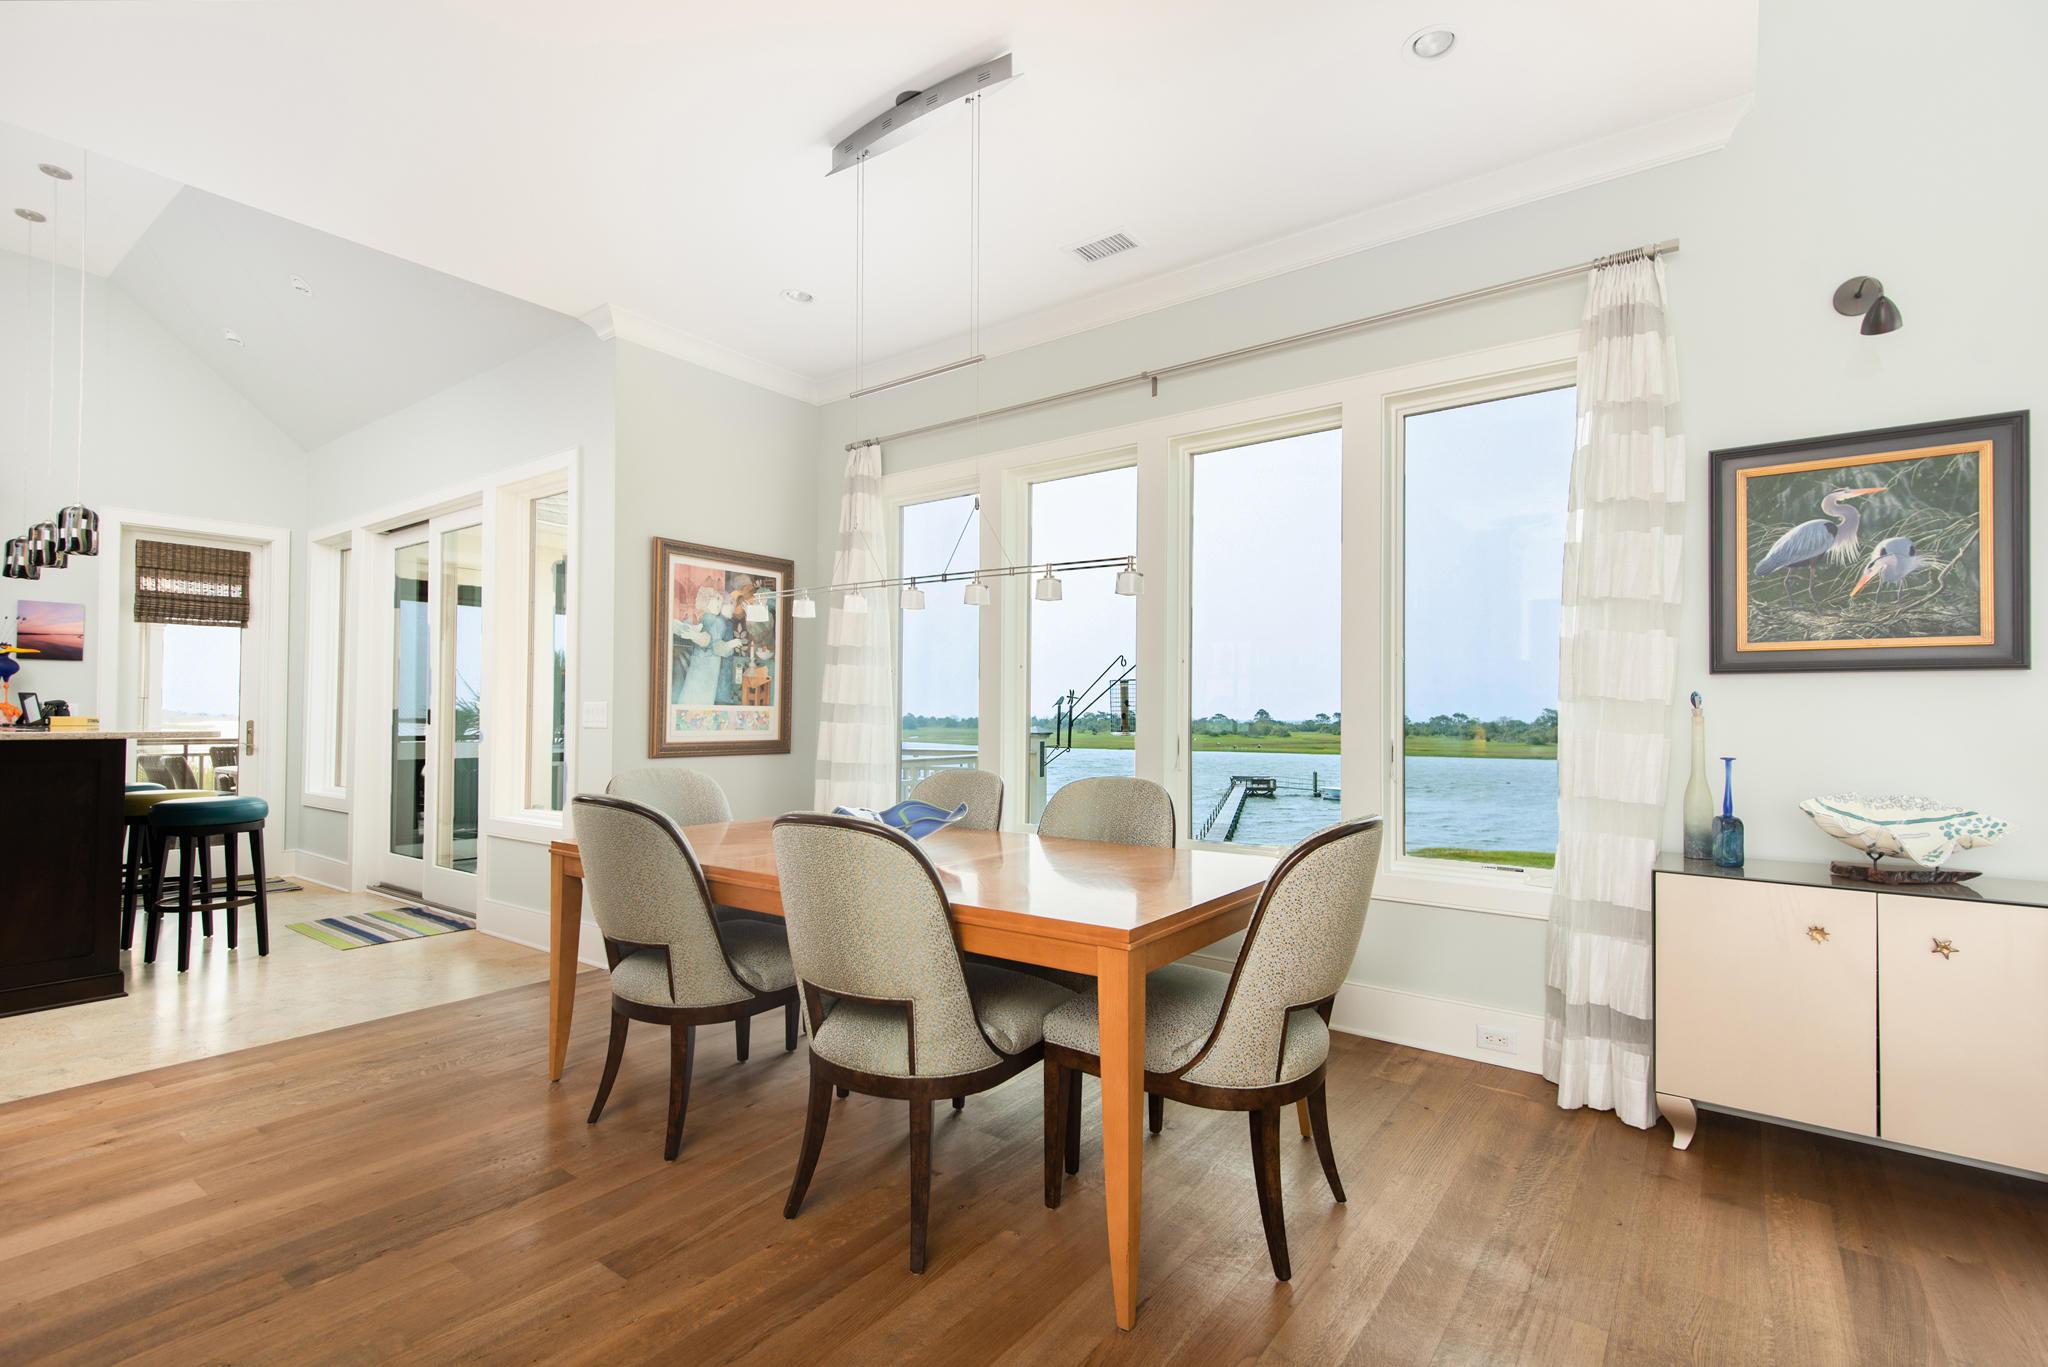 Seabrook Island Homes For Sale - 3135 Marshgate, Seabrook Island, SC - 54